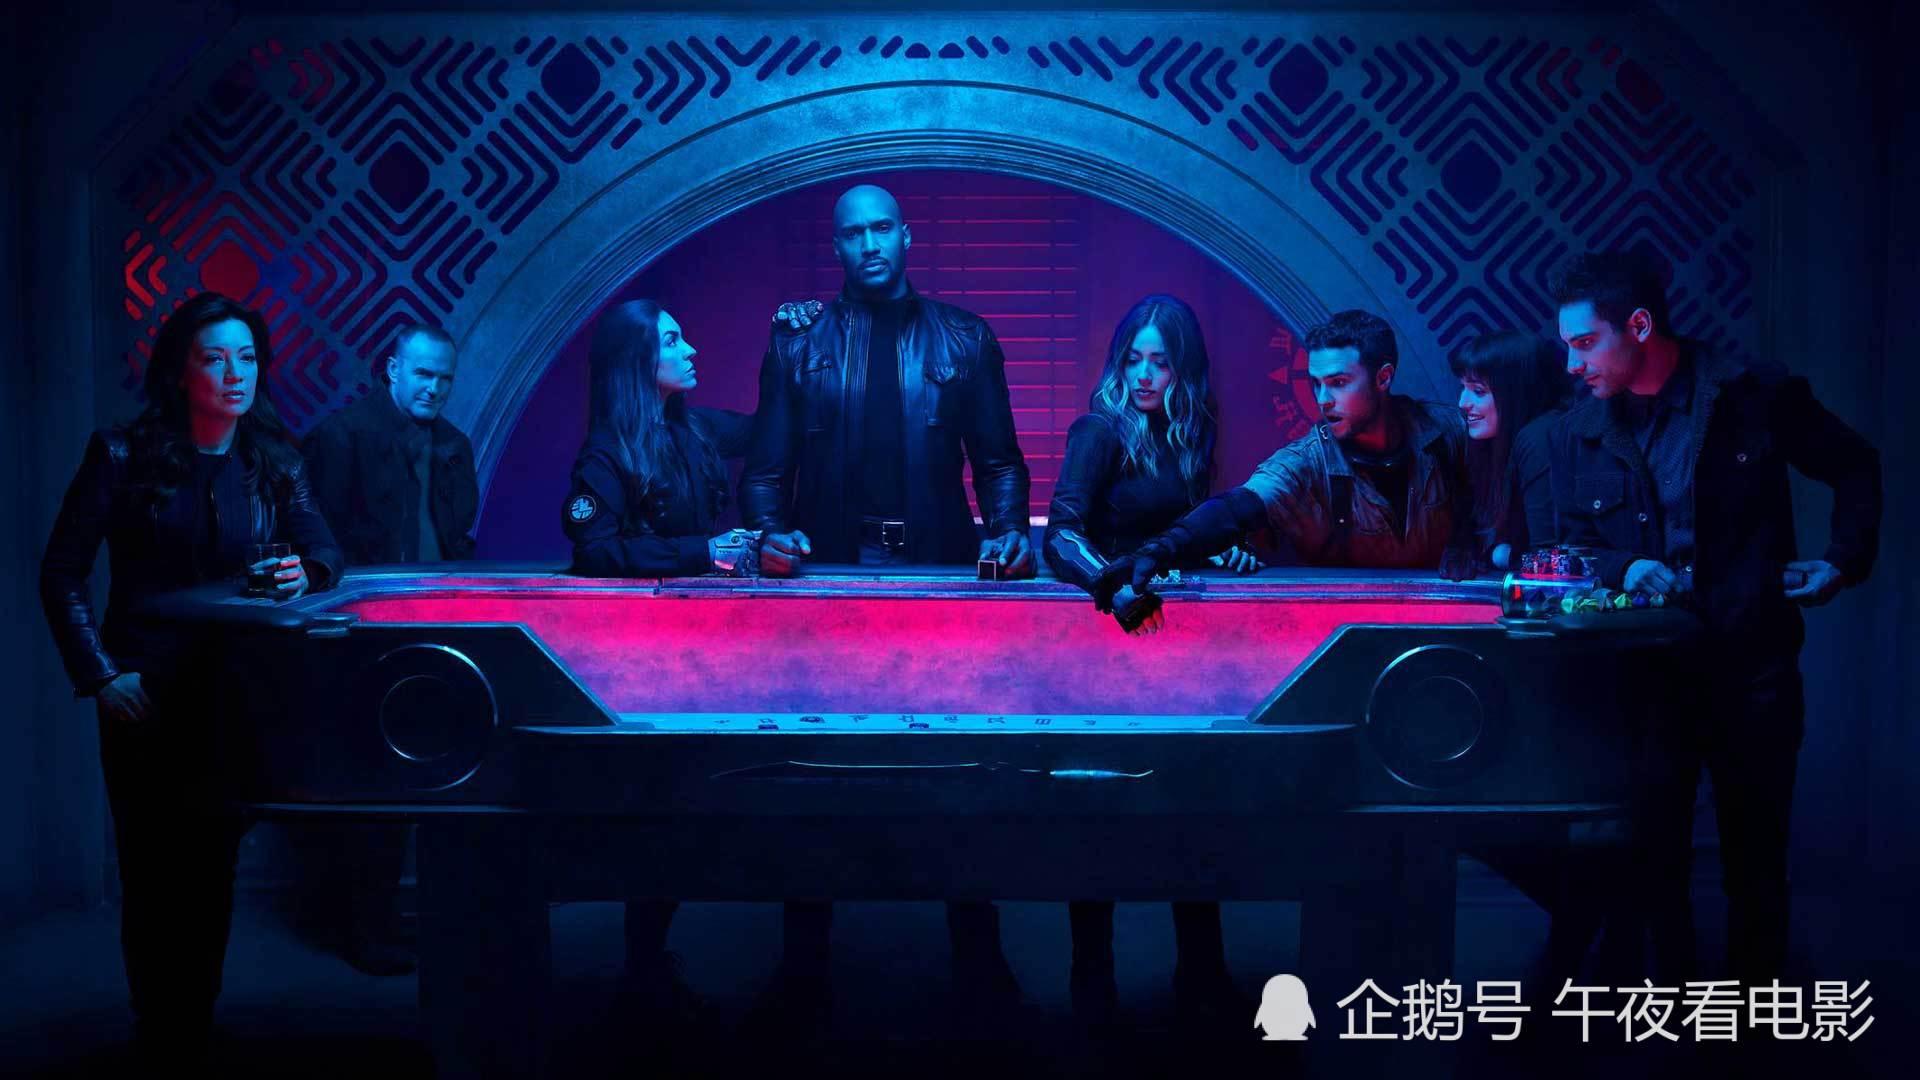 <b>《神盾局特工》第七季将在本周杀青,第七季也是该系列最后一季!</b>